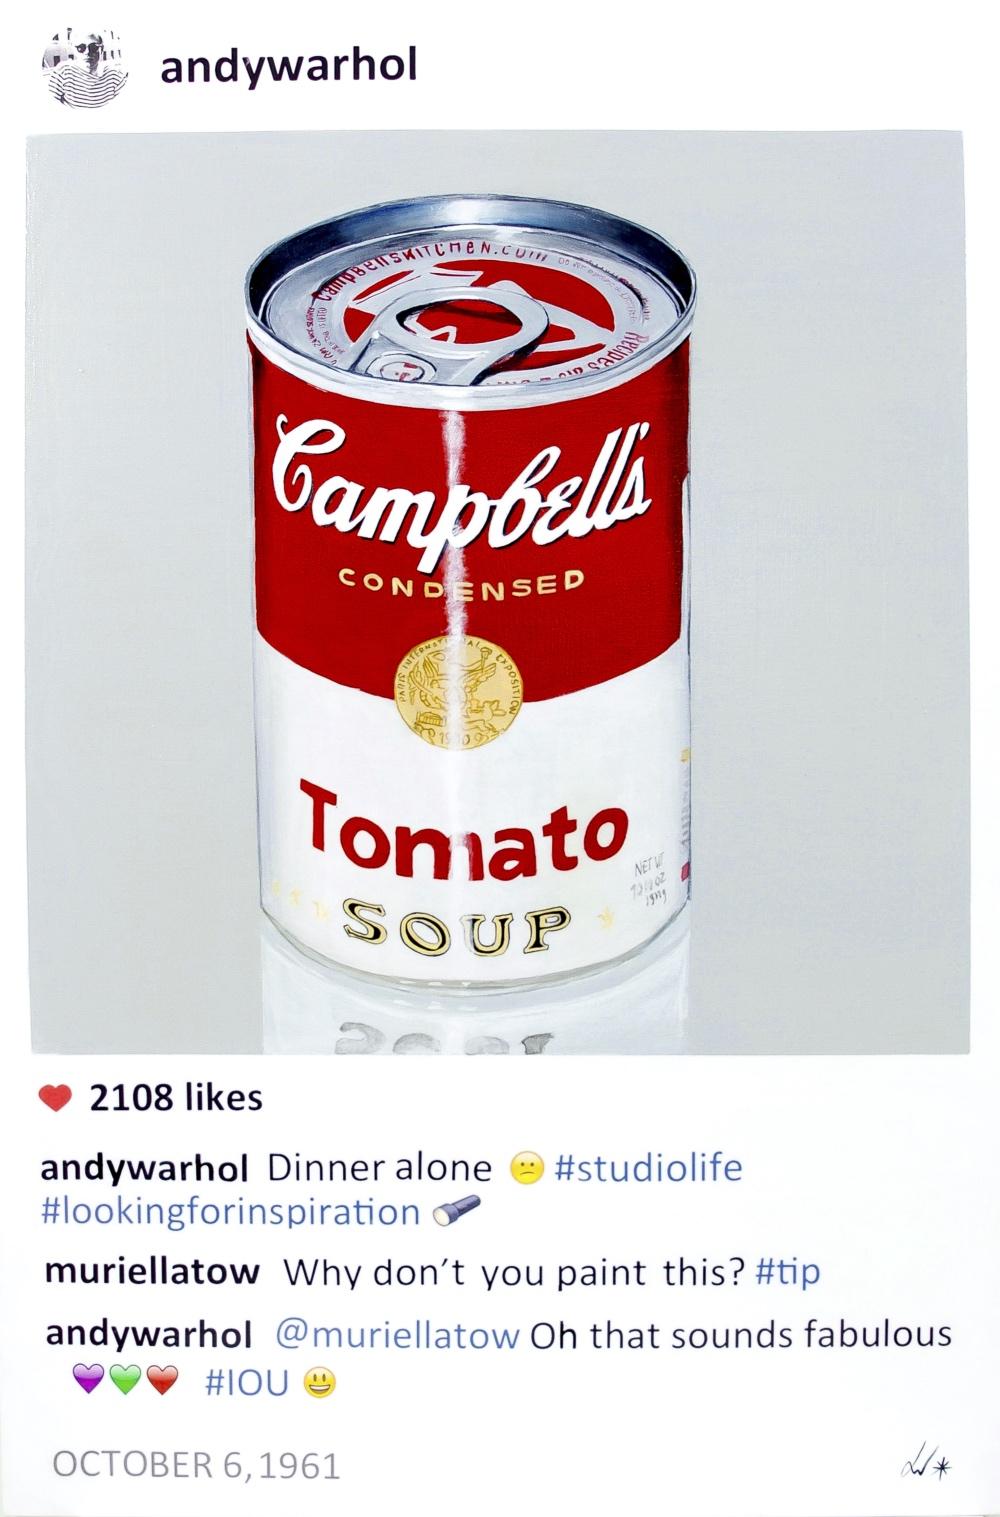 2016 Andy-s dinner small.jpg